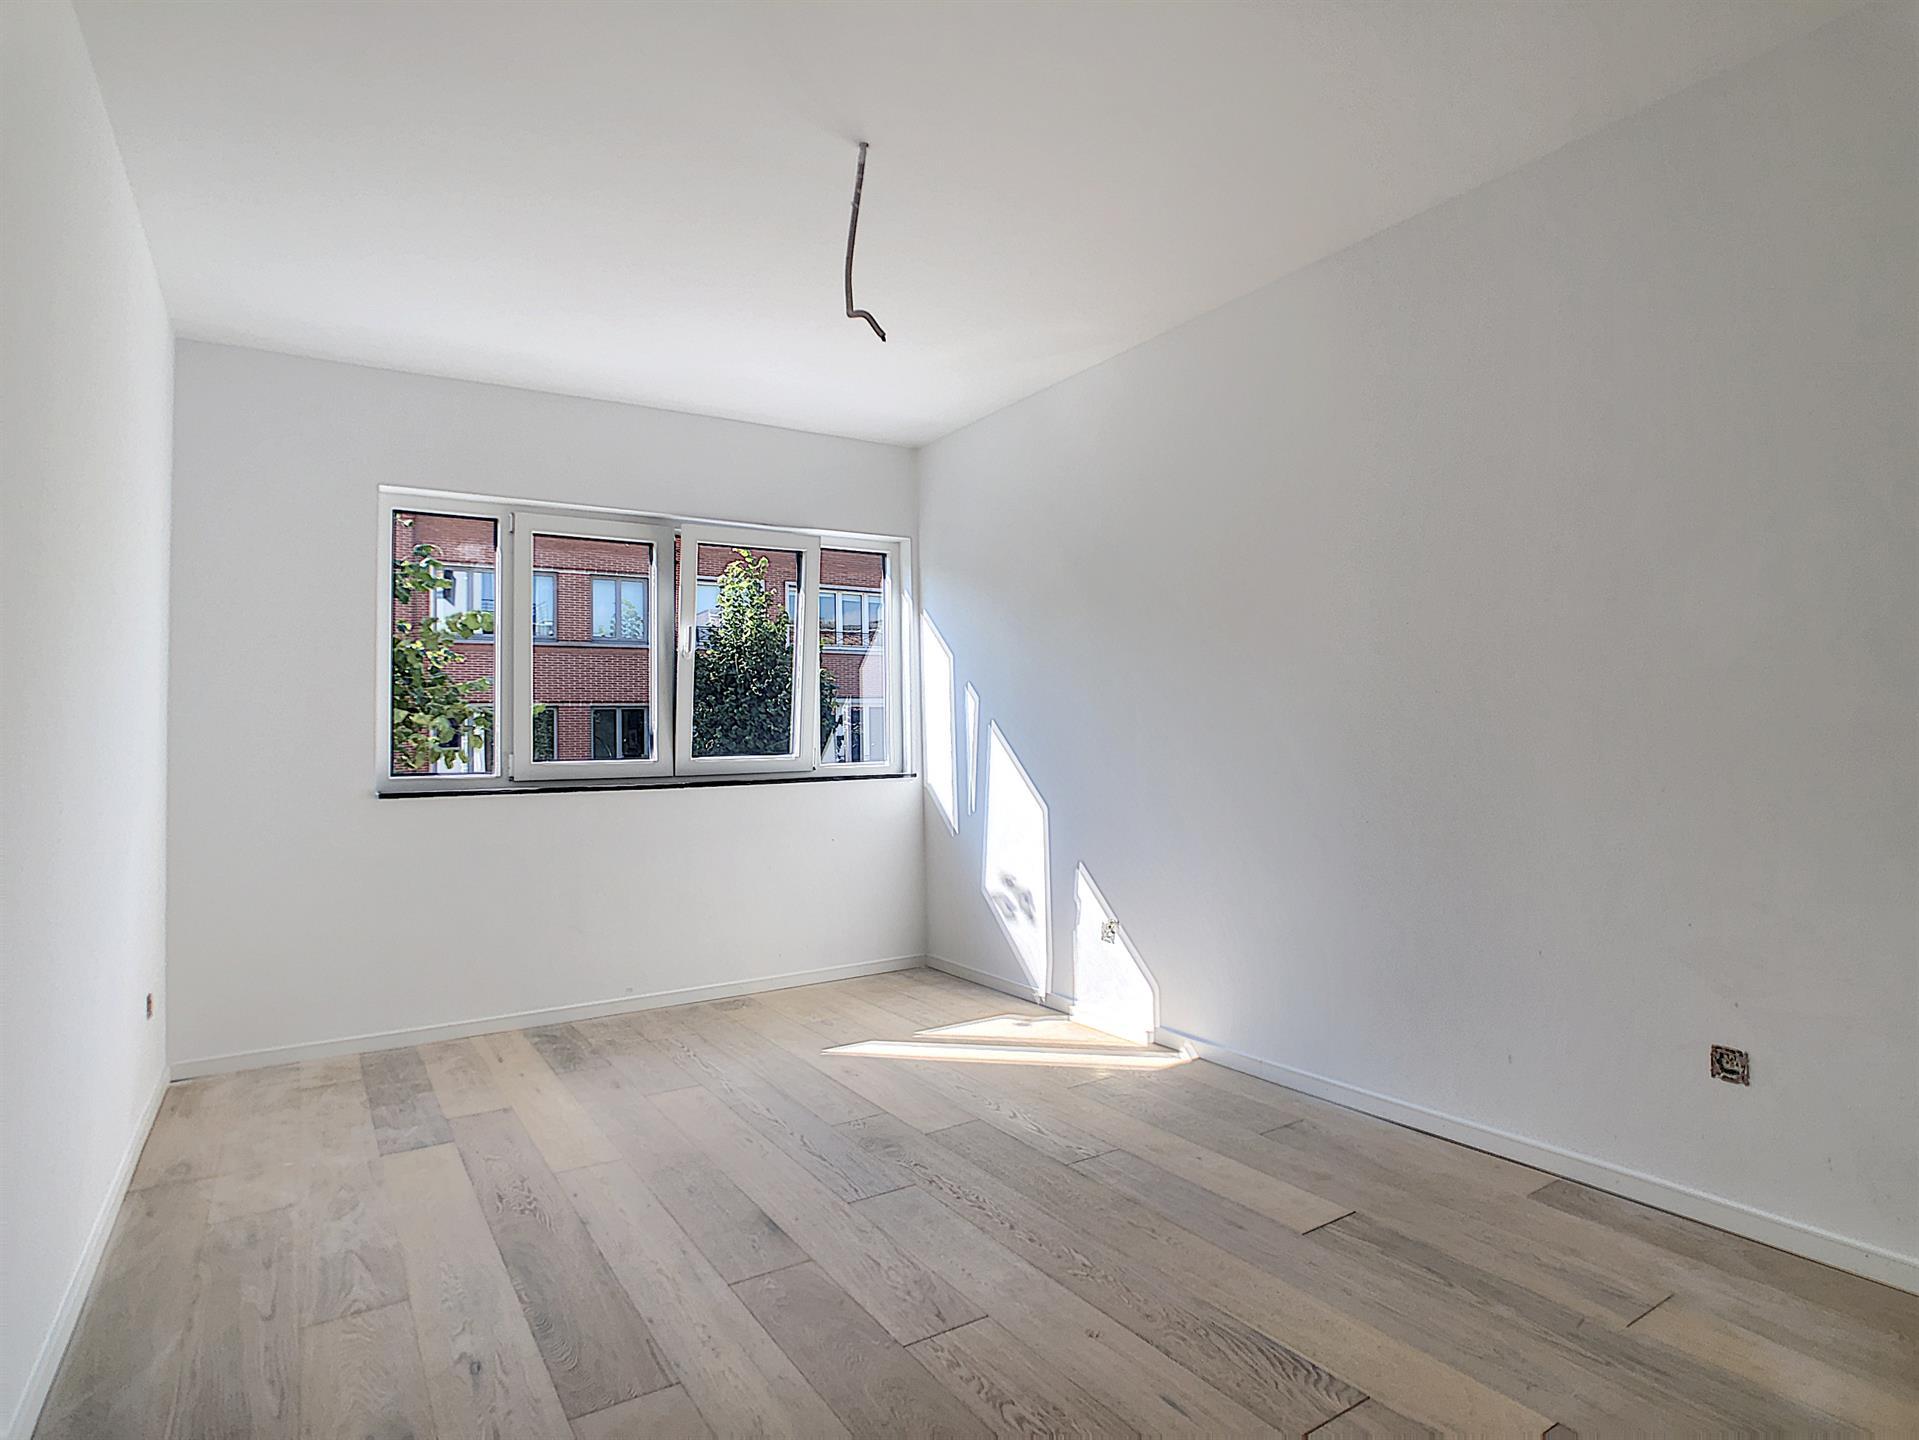 Appartement - Anderlecht - #4252377-0